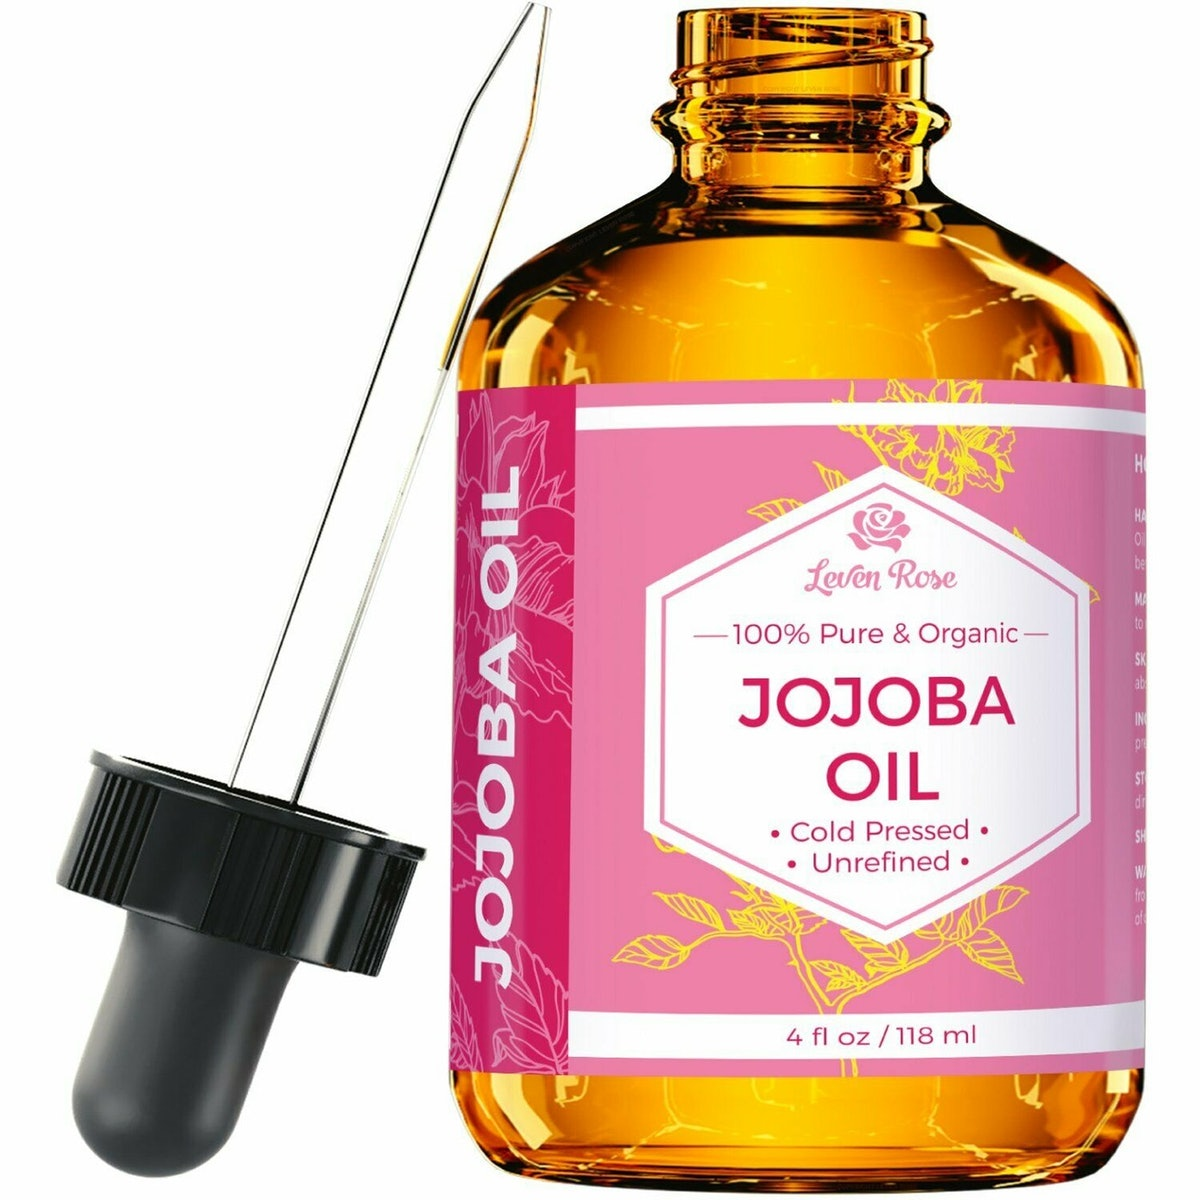 Leven Rose Cold Pressed Jojoba Oil